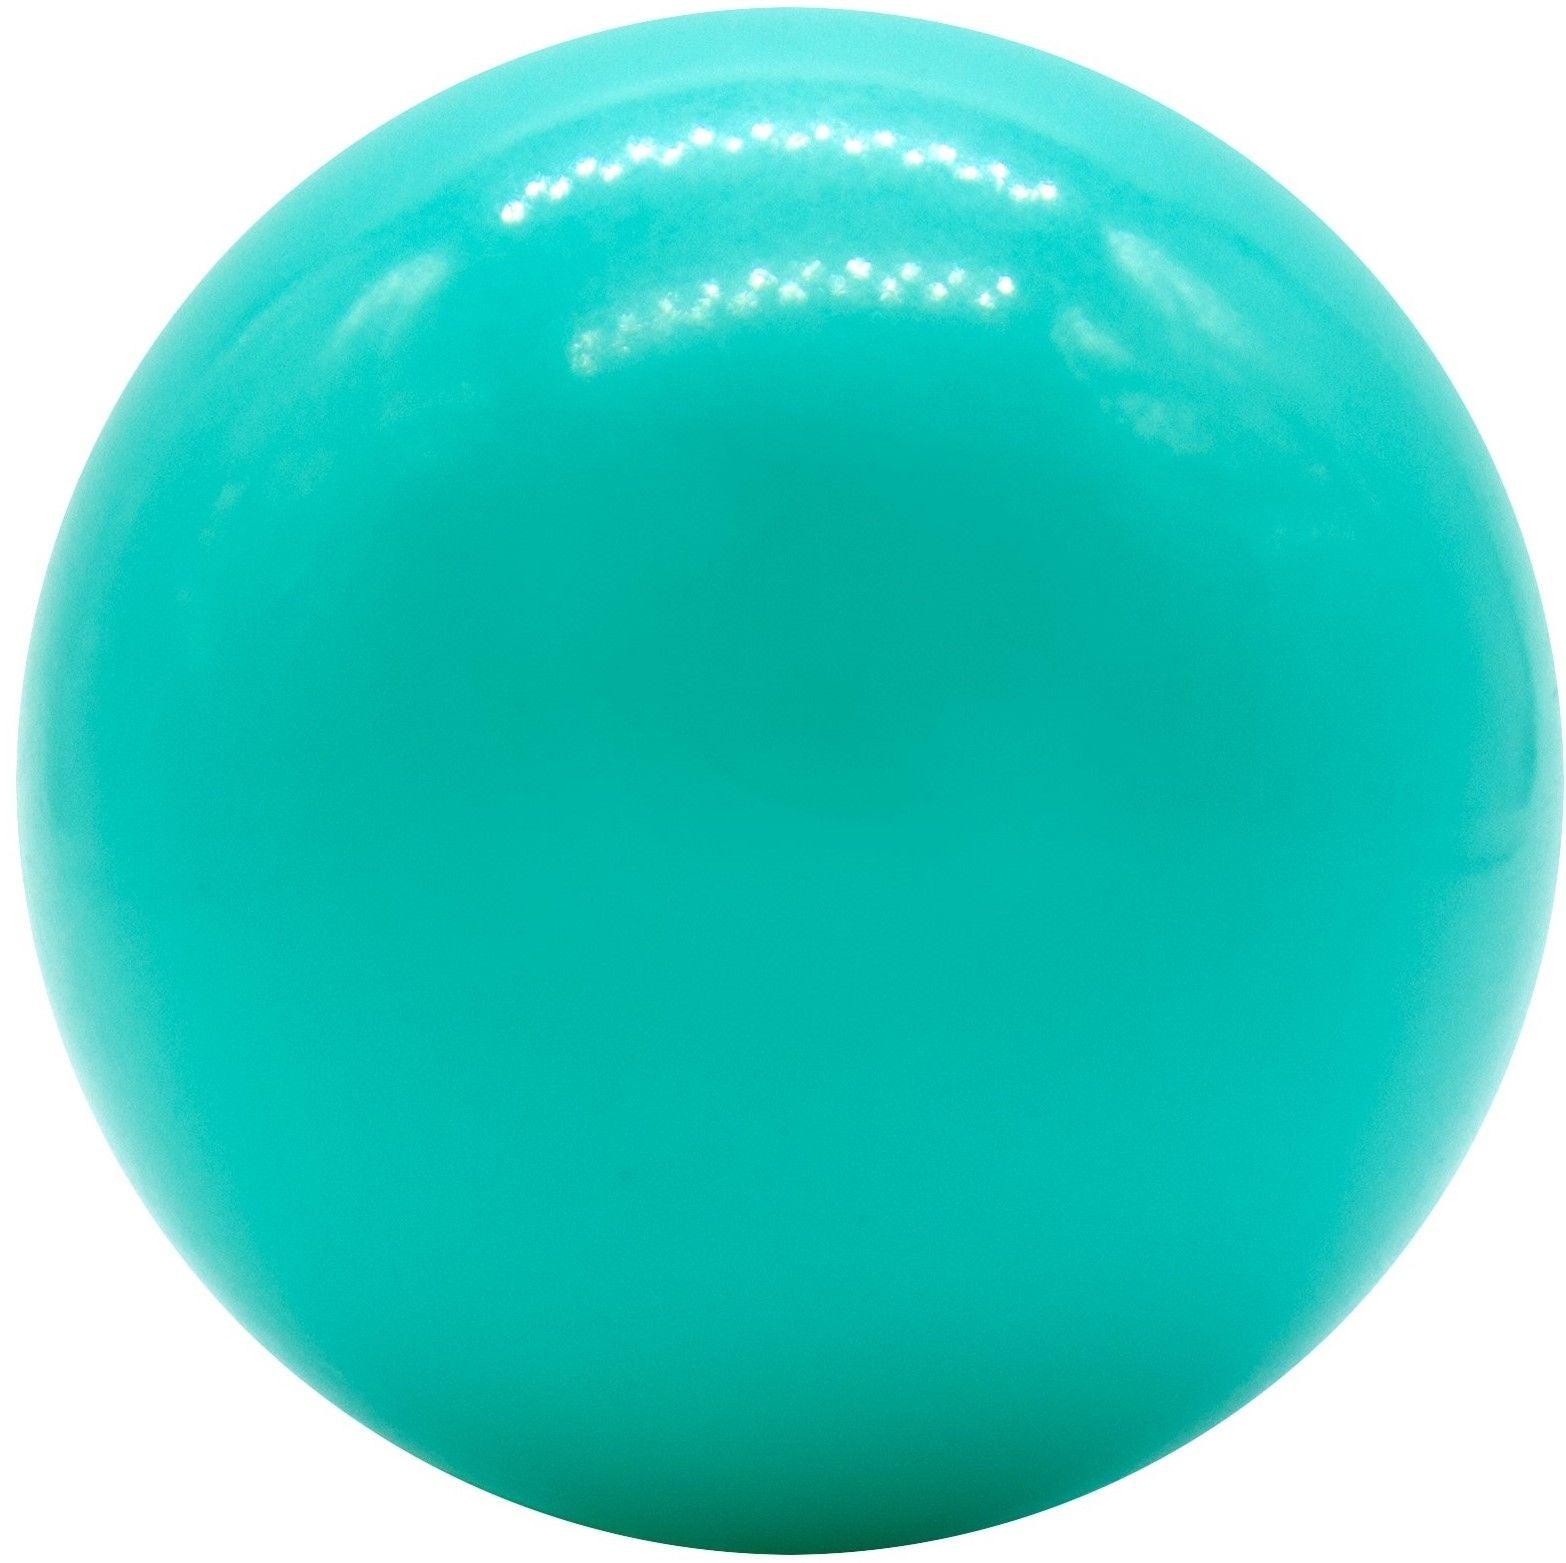 KIDKII Extra Bollar 50 st, Mint